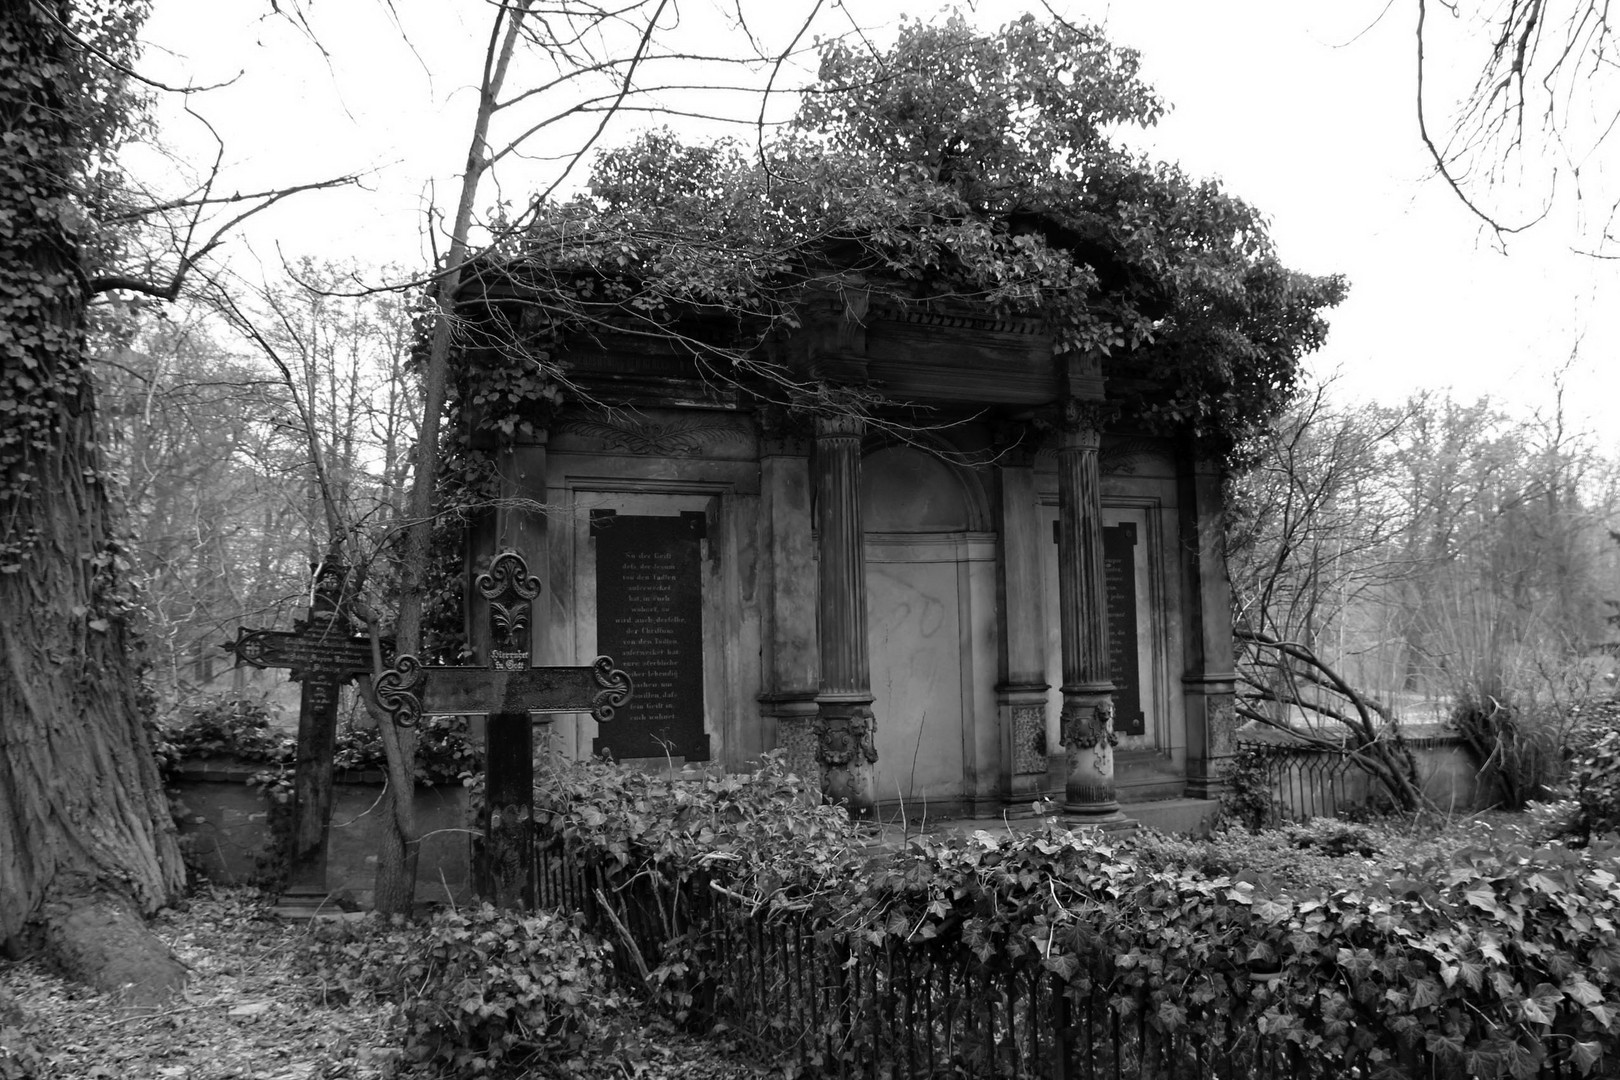 Friedhof Dorfkirche Alt-Tempelhof in Berlin